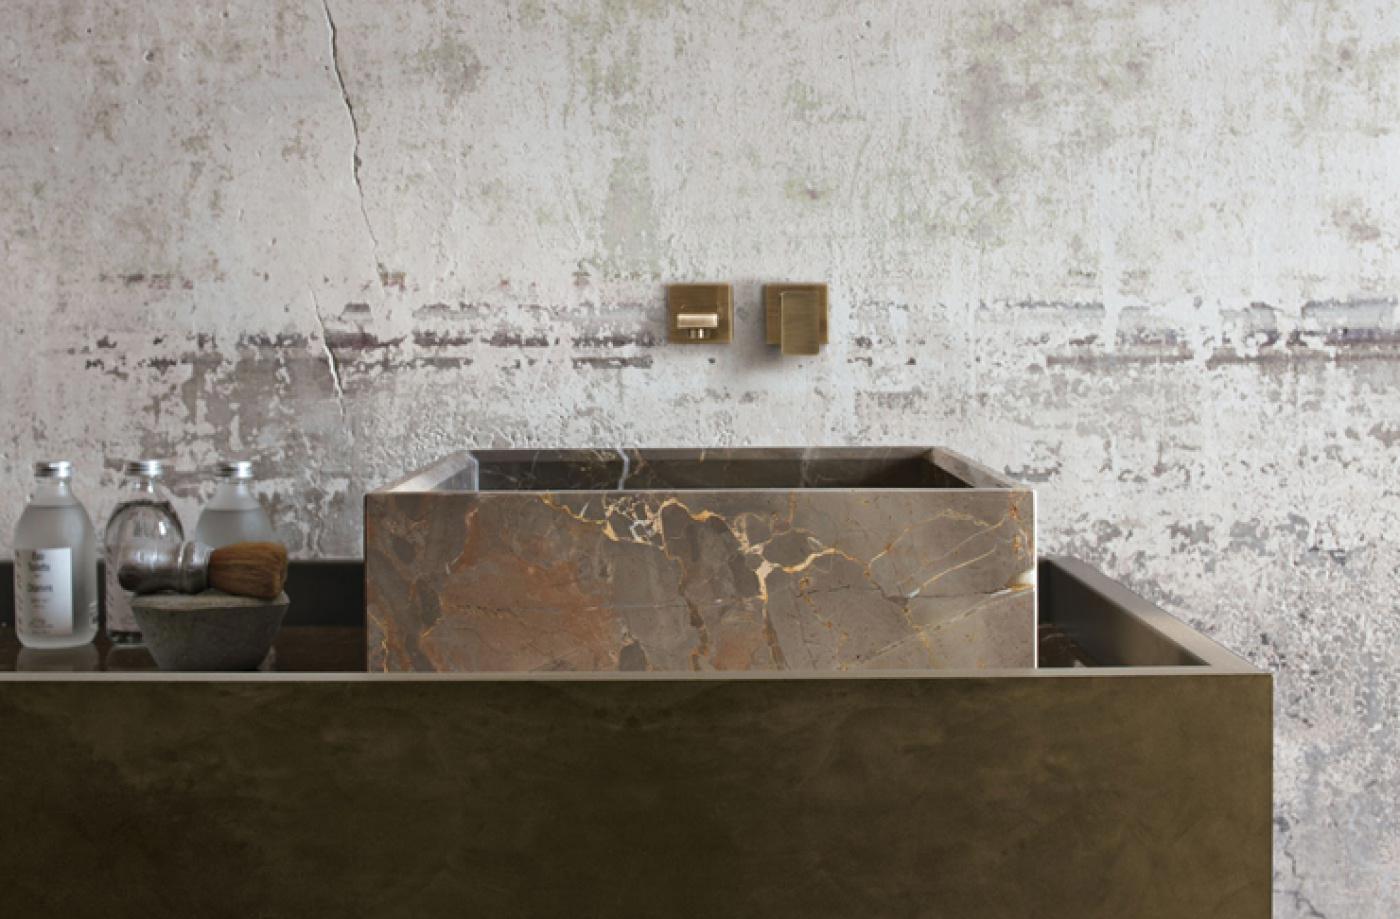 Granit Bains avec meuble et robinet Altamarea Must. Vasque en Arabescato Orobico Gold.